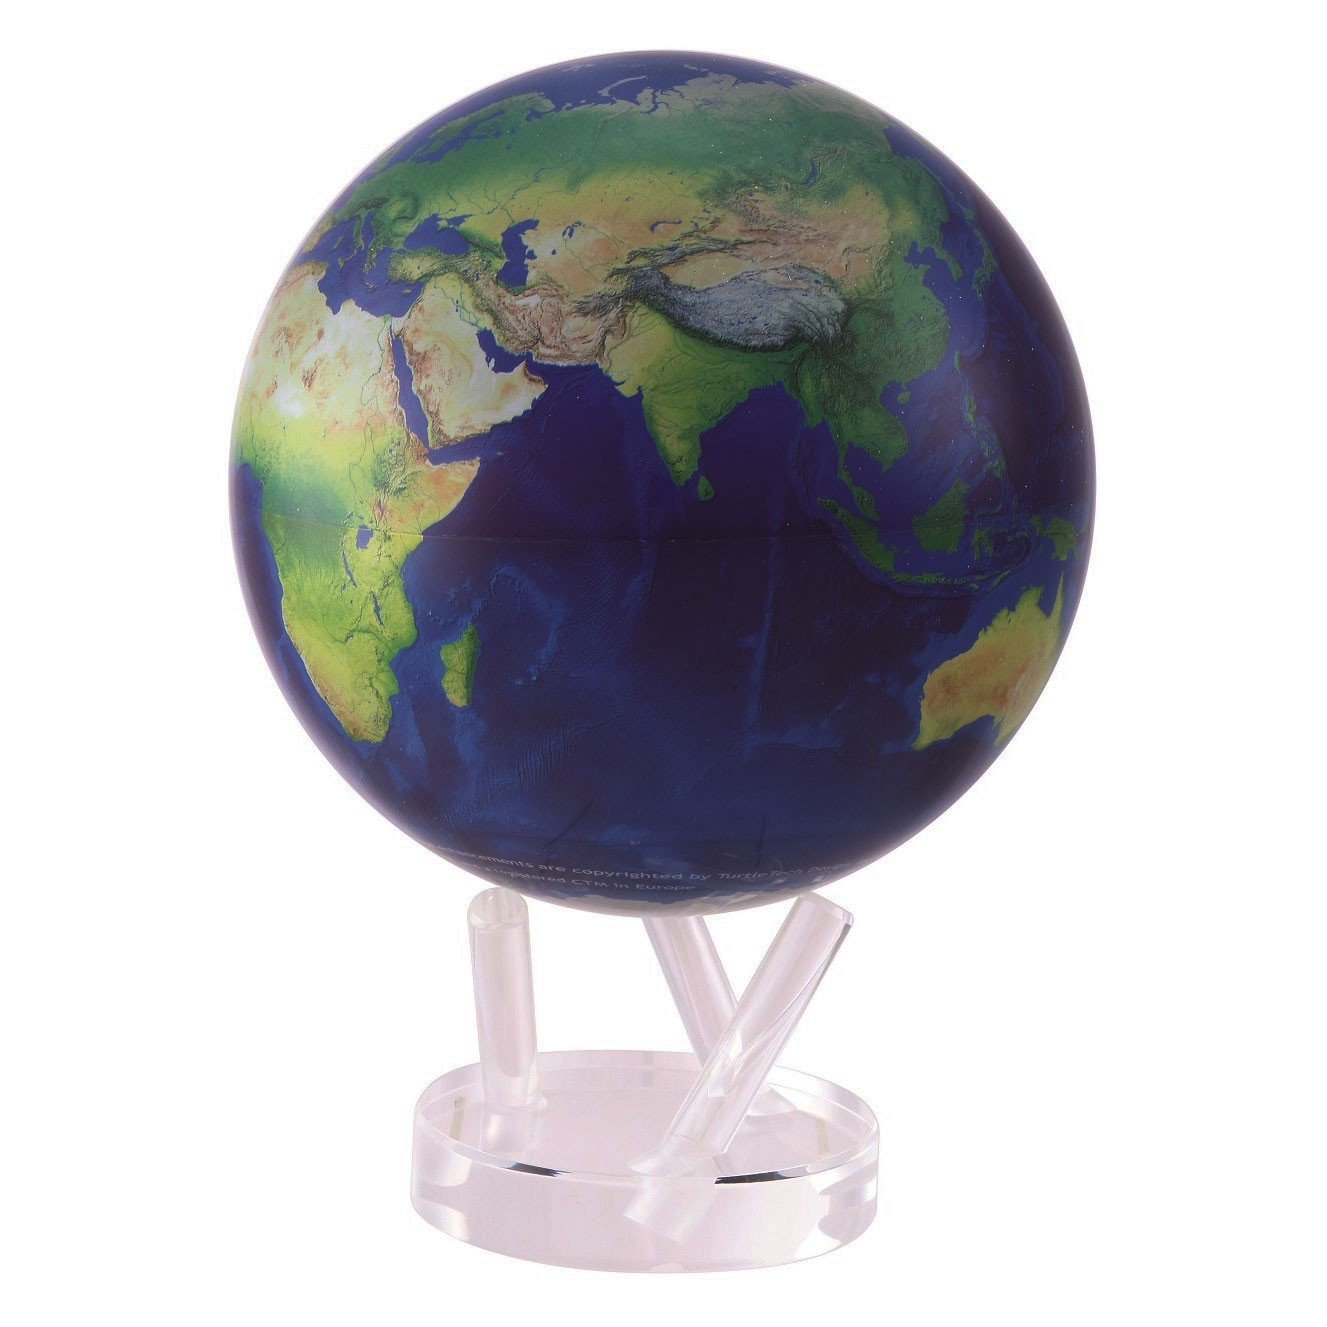 Globe autorotatif bleu / vue satellite 216 mm (8,5')